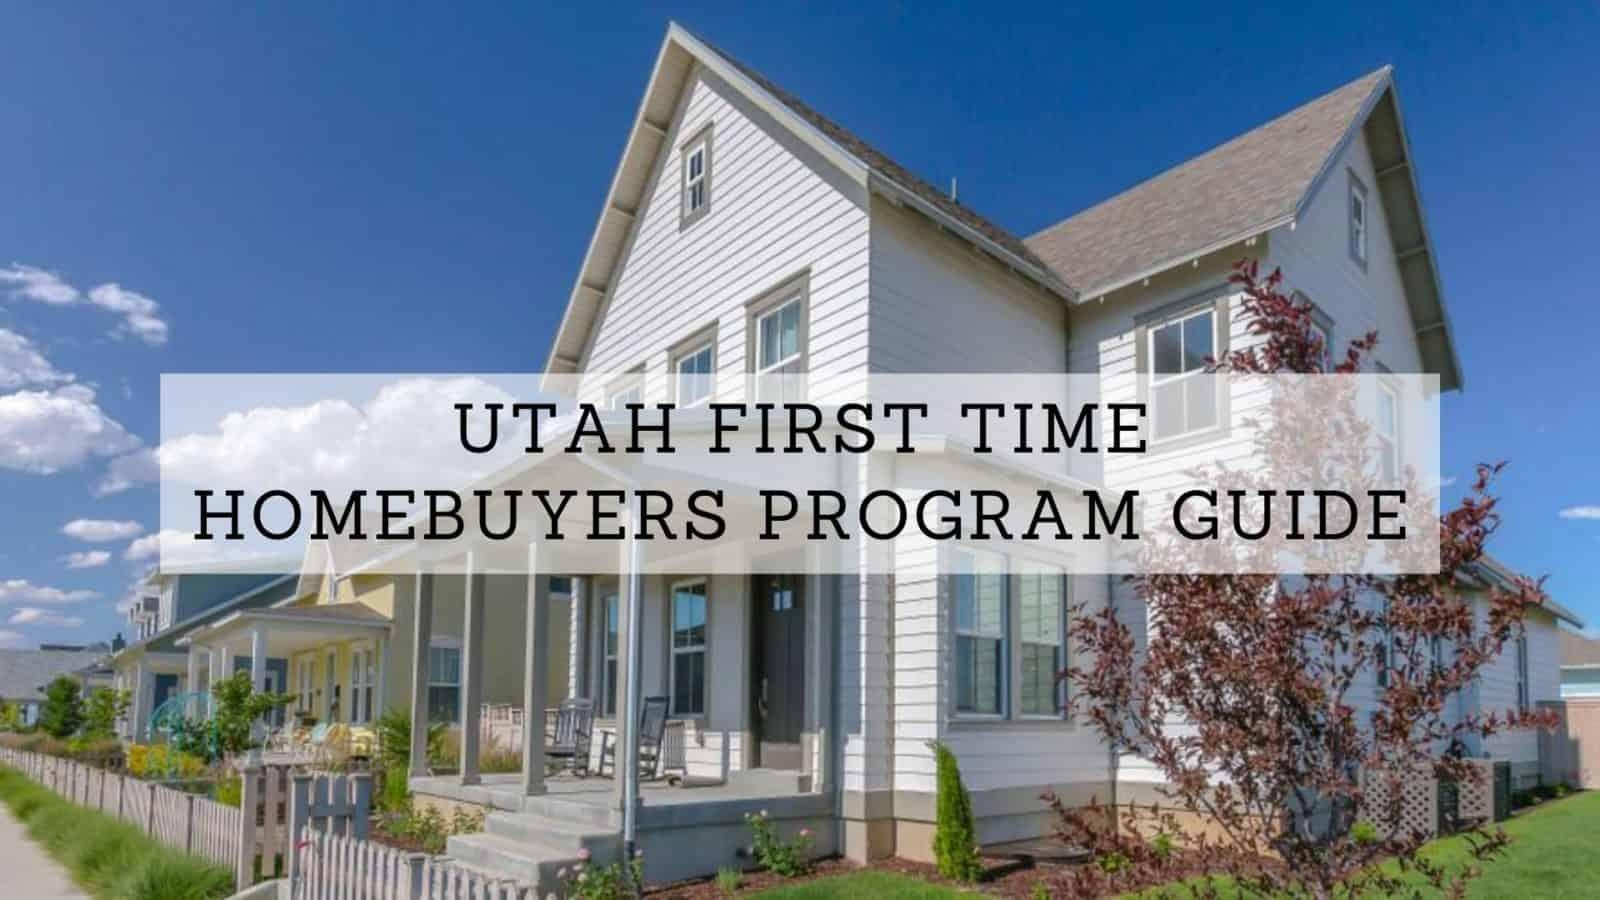 Utah First Time Homebuyers Program Guide